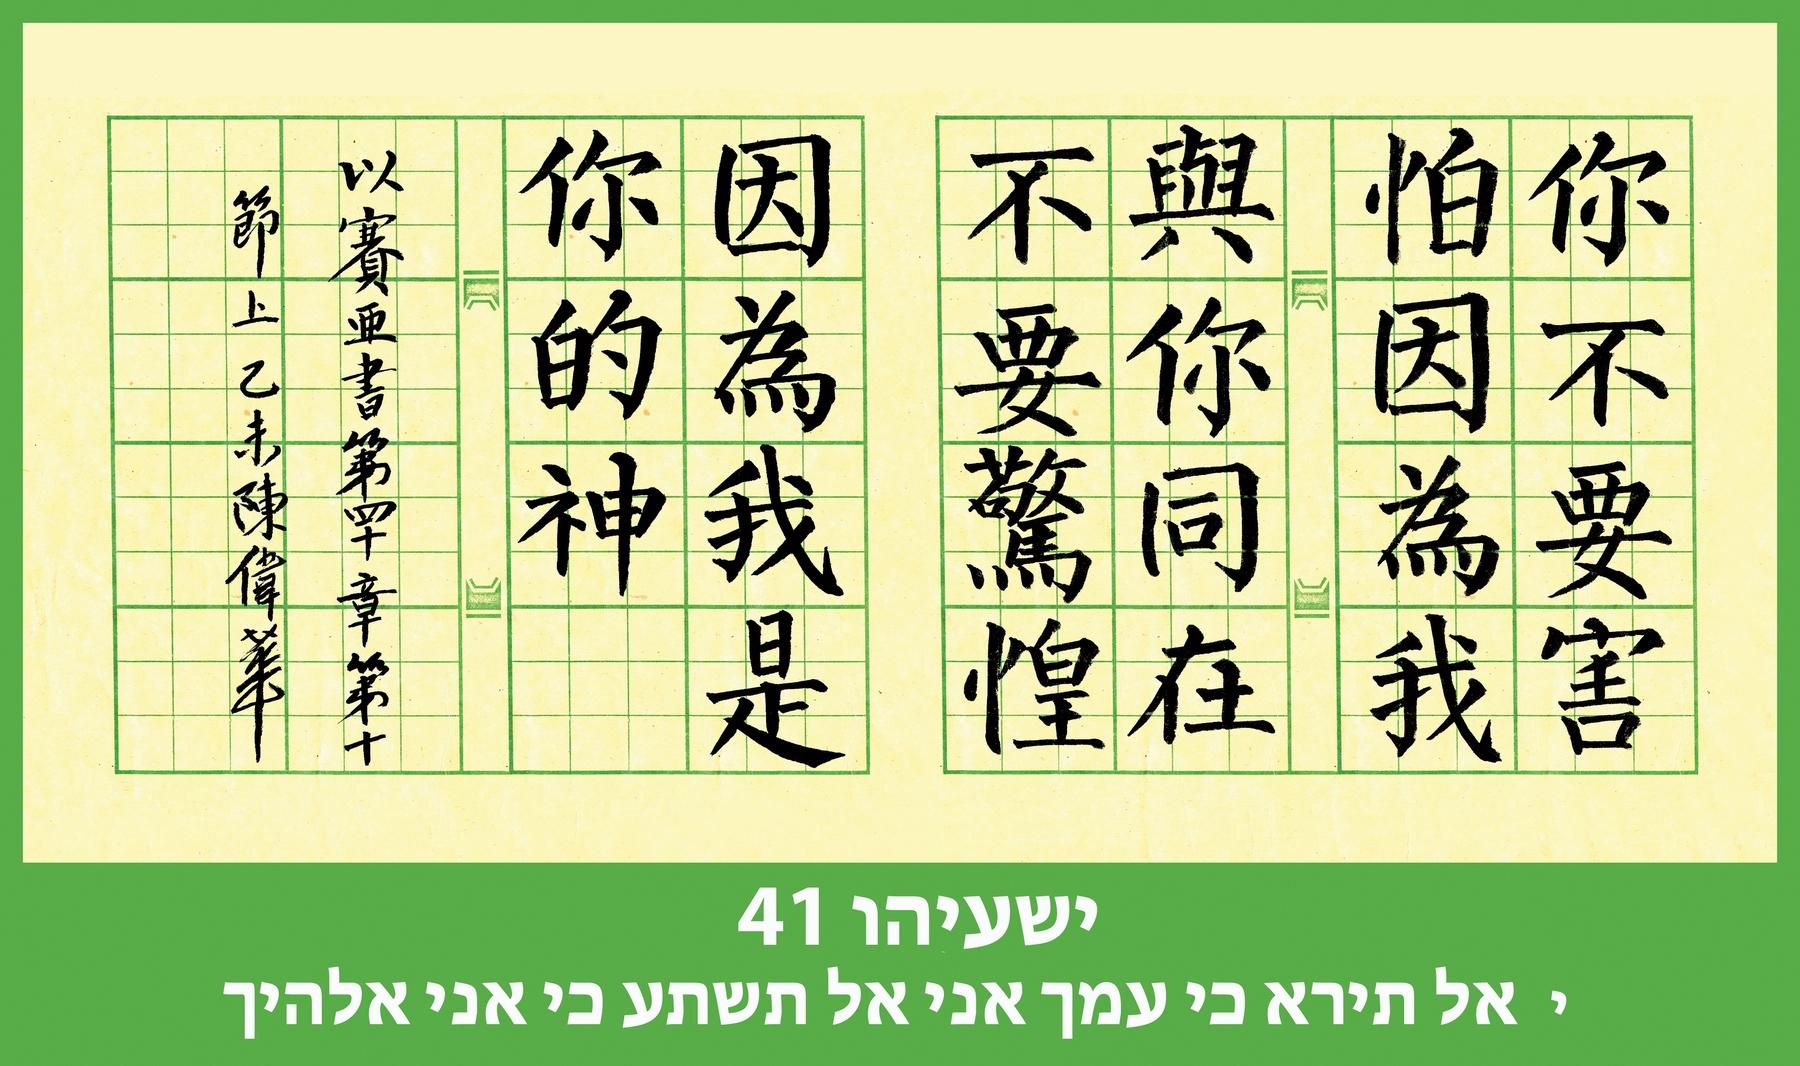 Hkbcc upper primary division maha Hebrew calligraphy art